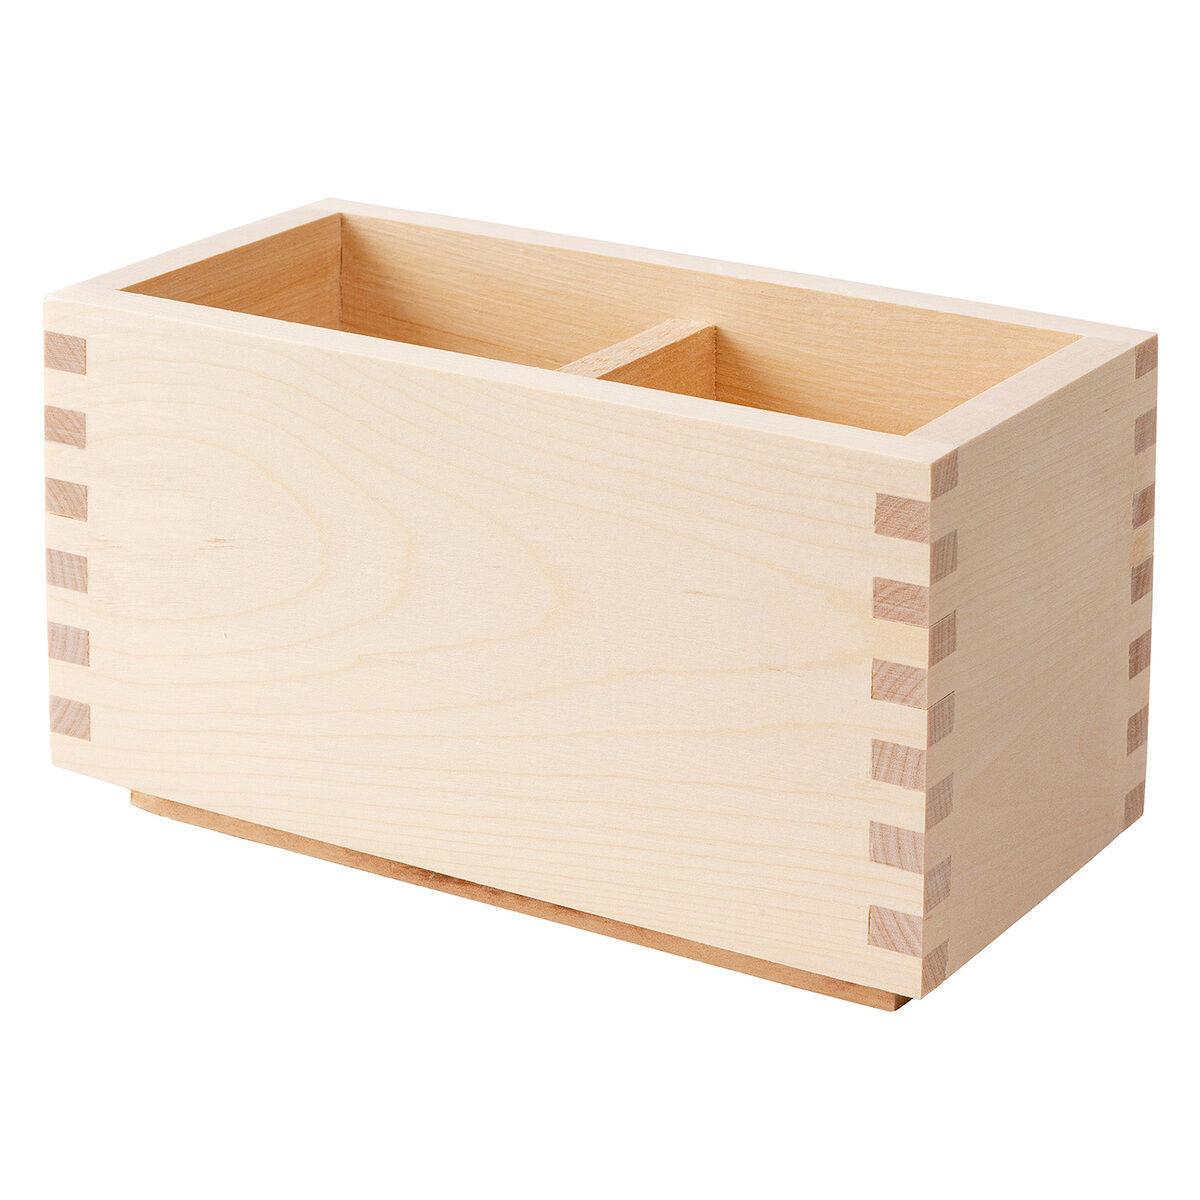 Verso Design Pala Box 3